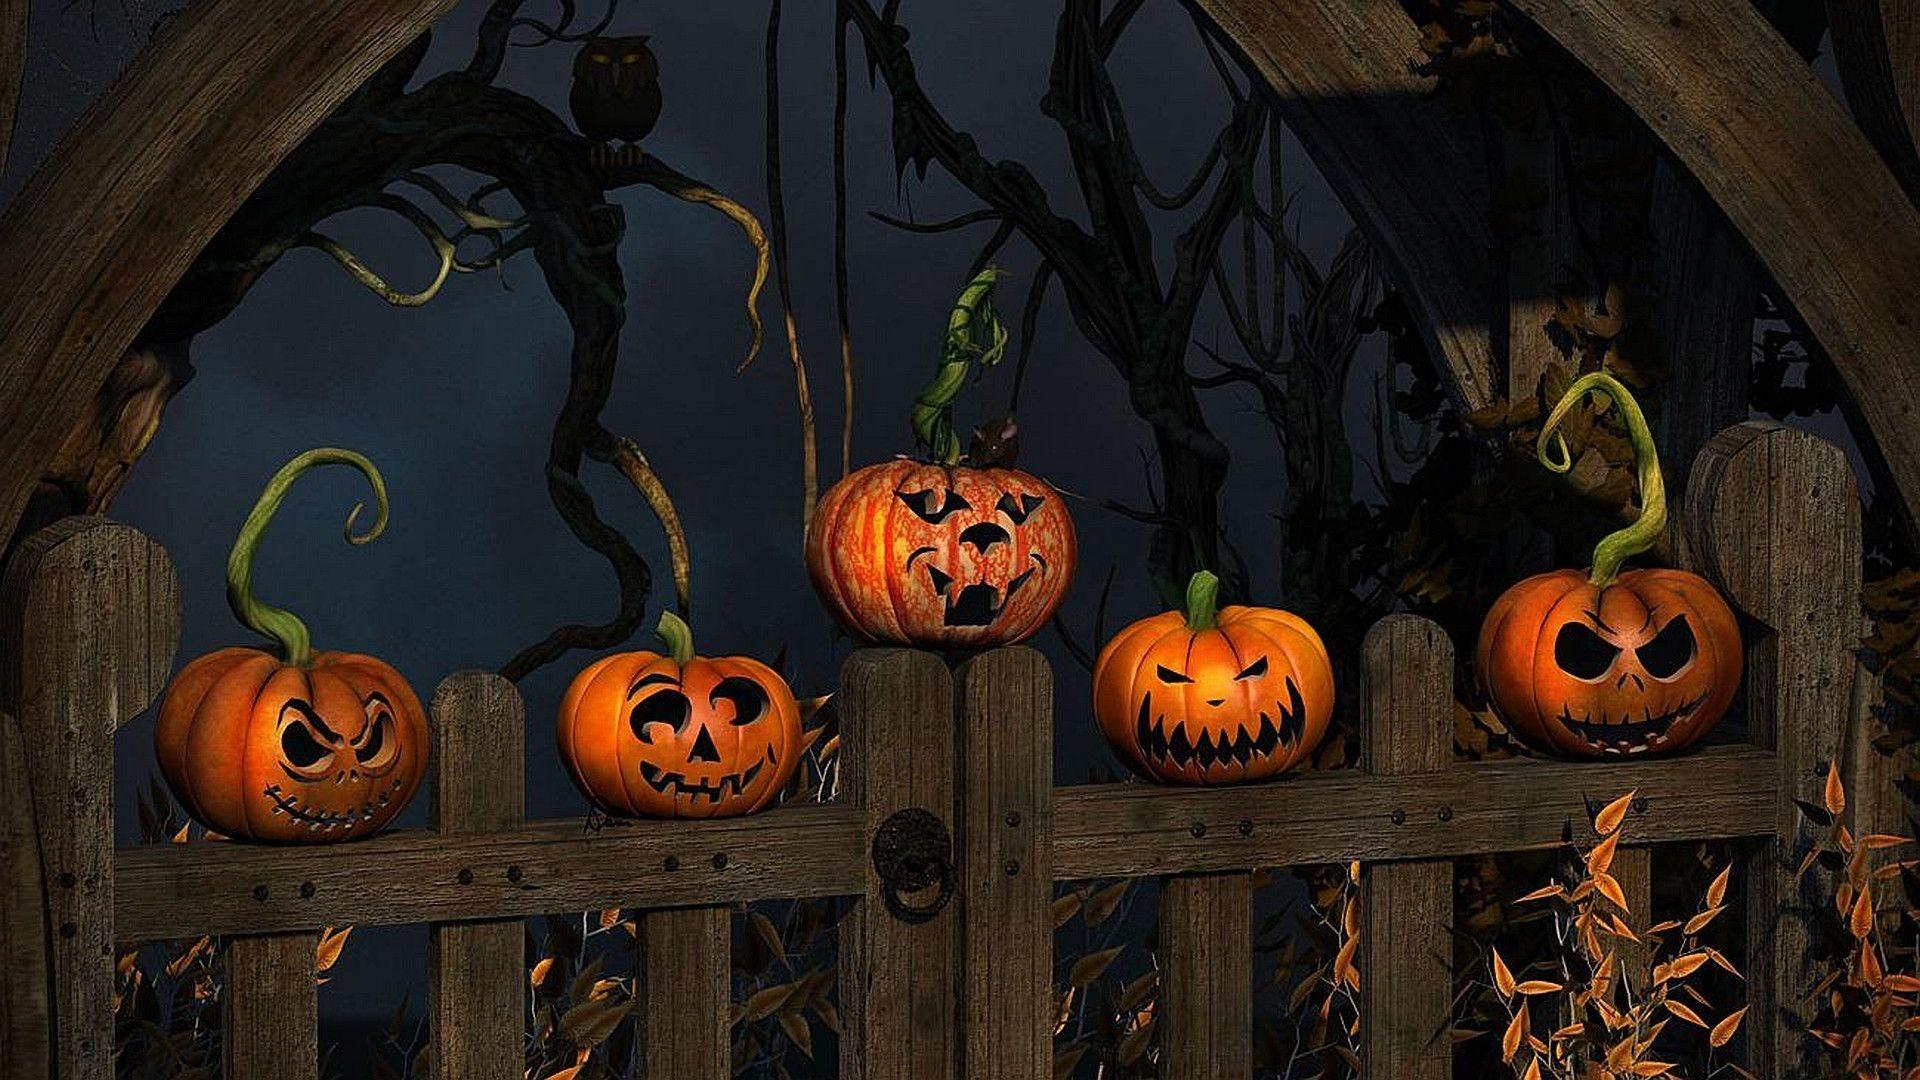 Halloween Wallpaper Pictures 74 images 1920x1080